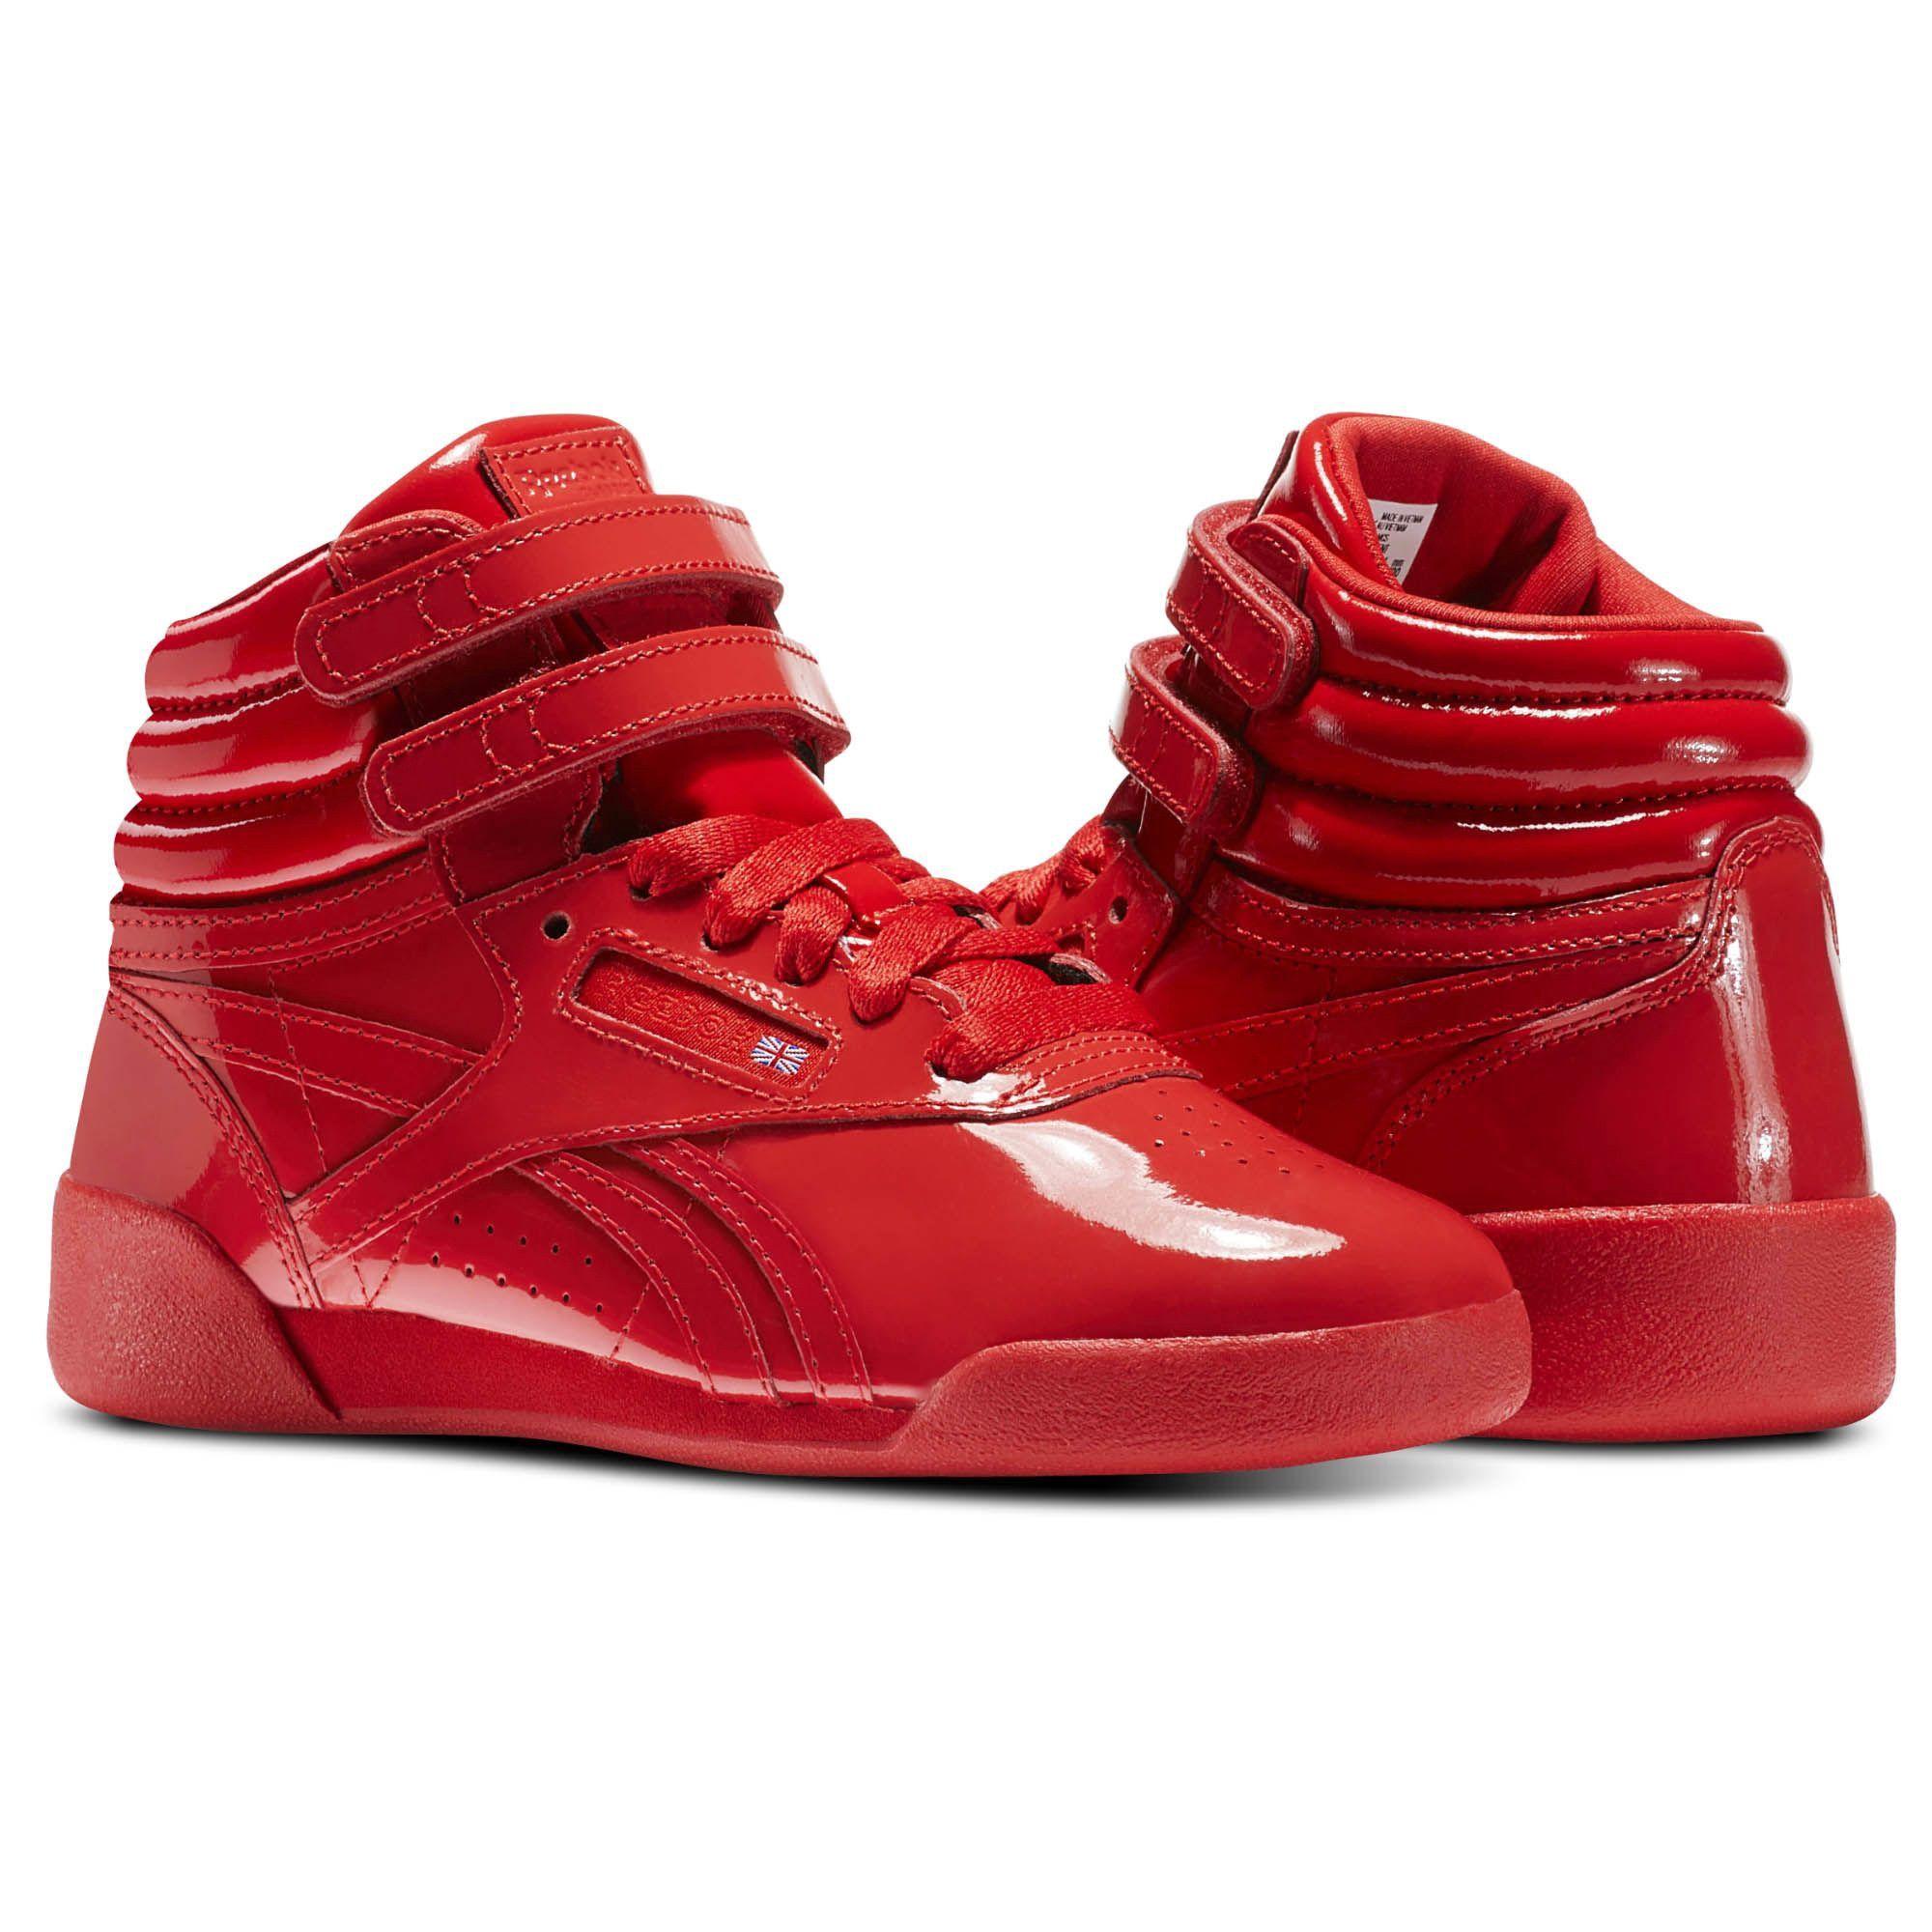 b68fb47c300 Reebok Freestyle Hi Patent Leather - Pre-School Red 3